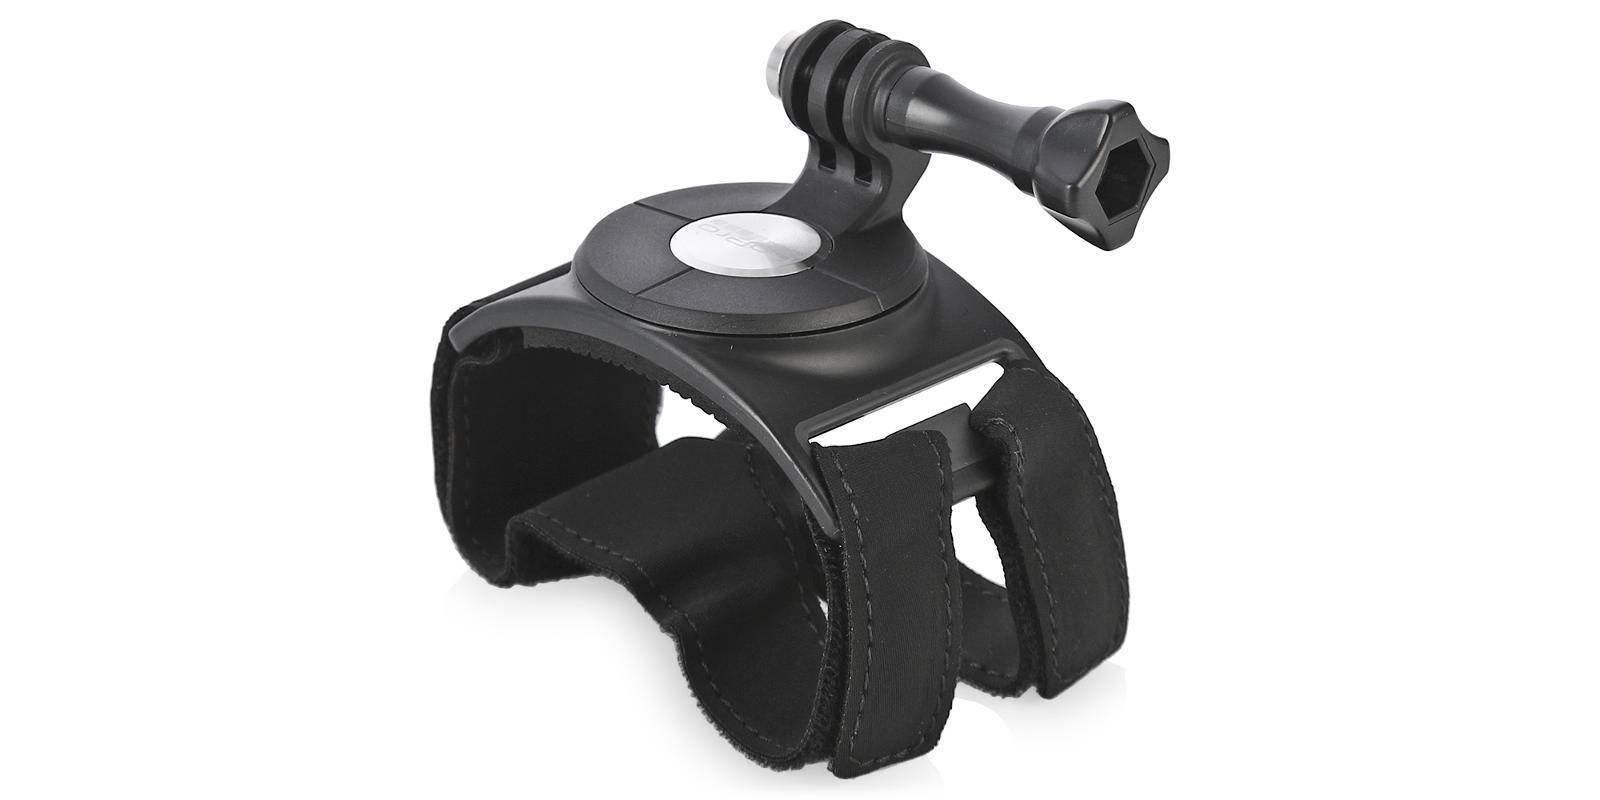 Крепление на руку GoPro Hand + Wrist Strap (AHWBM-002) сбоку без камеры